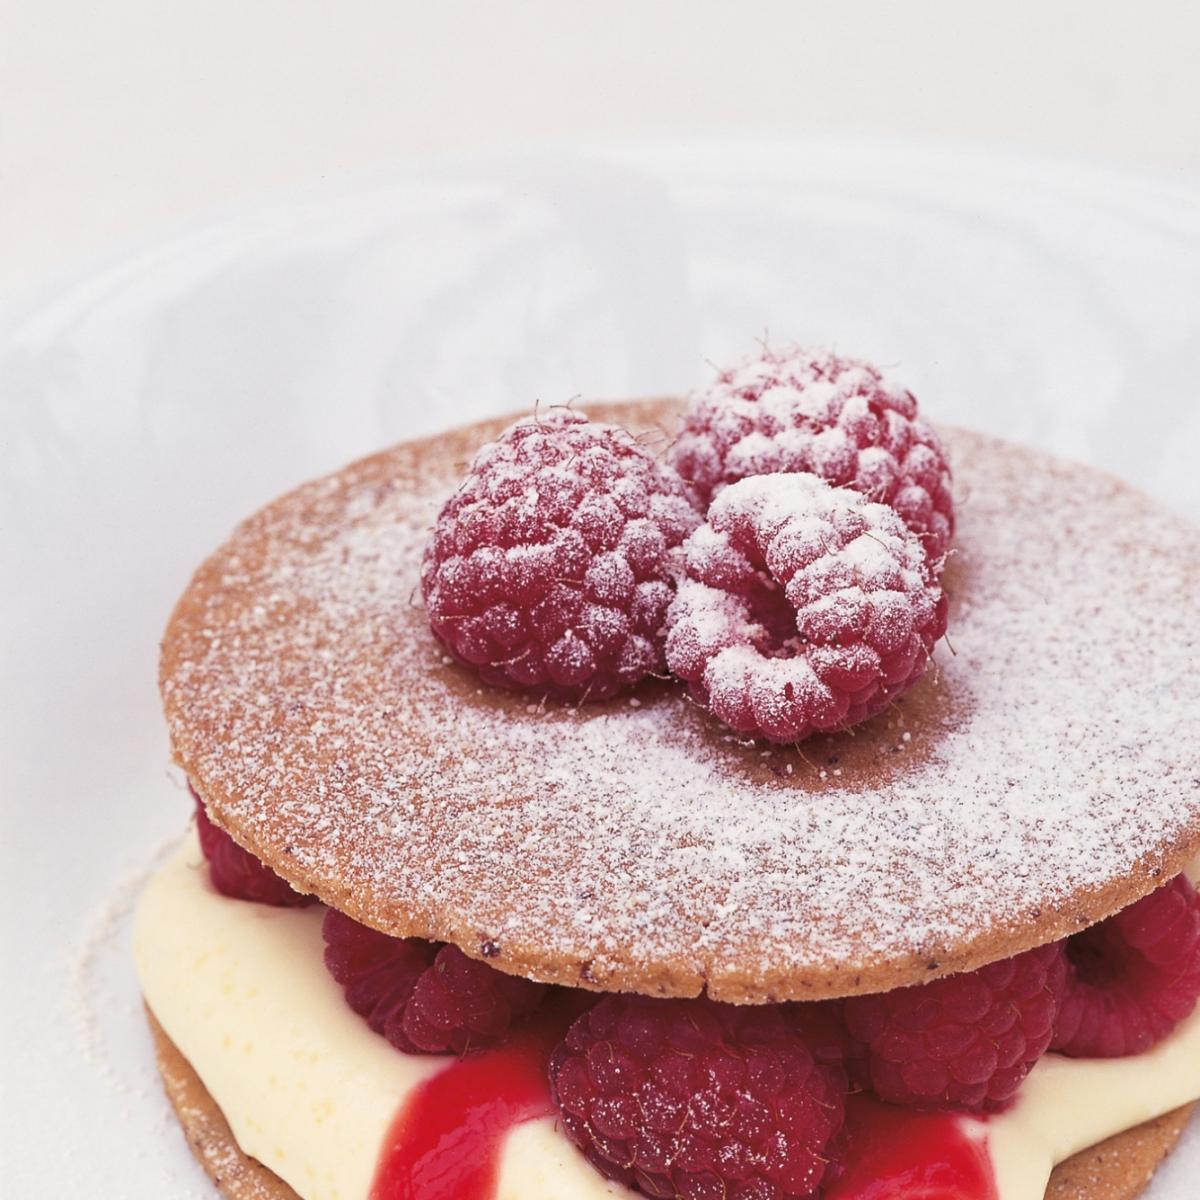 Htc pecan shortbreads with raspberries and raspberry puree